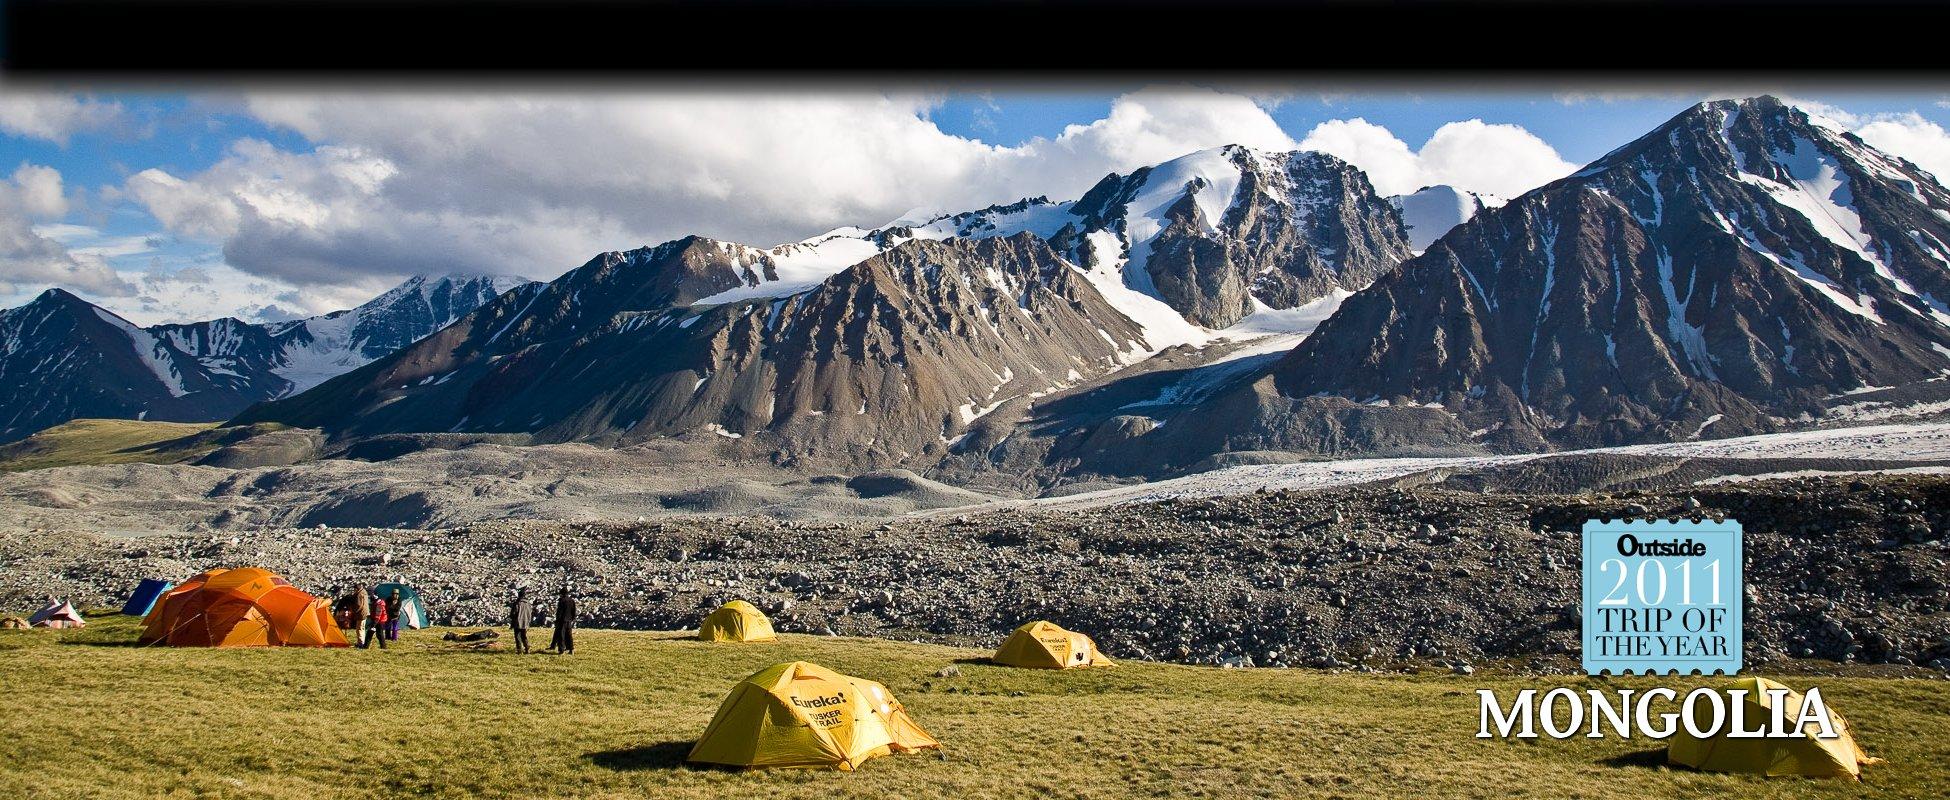 Mongolia Trek Dates & Prices